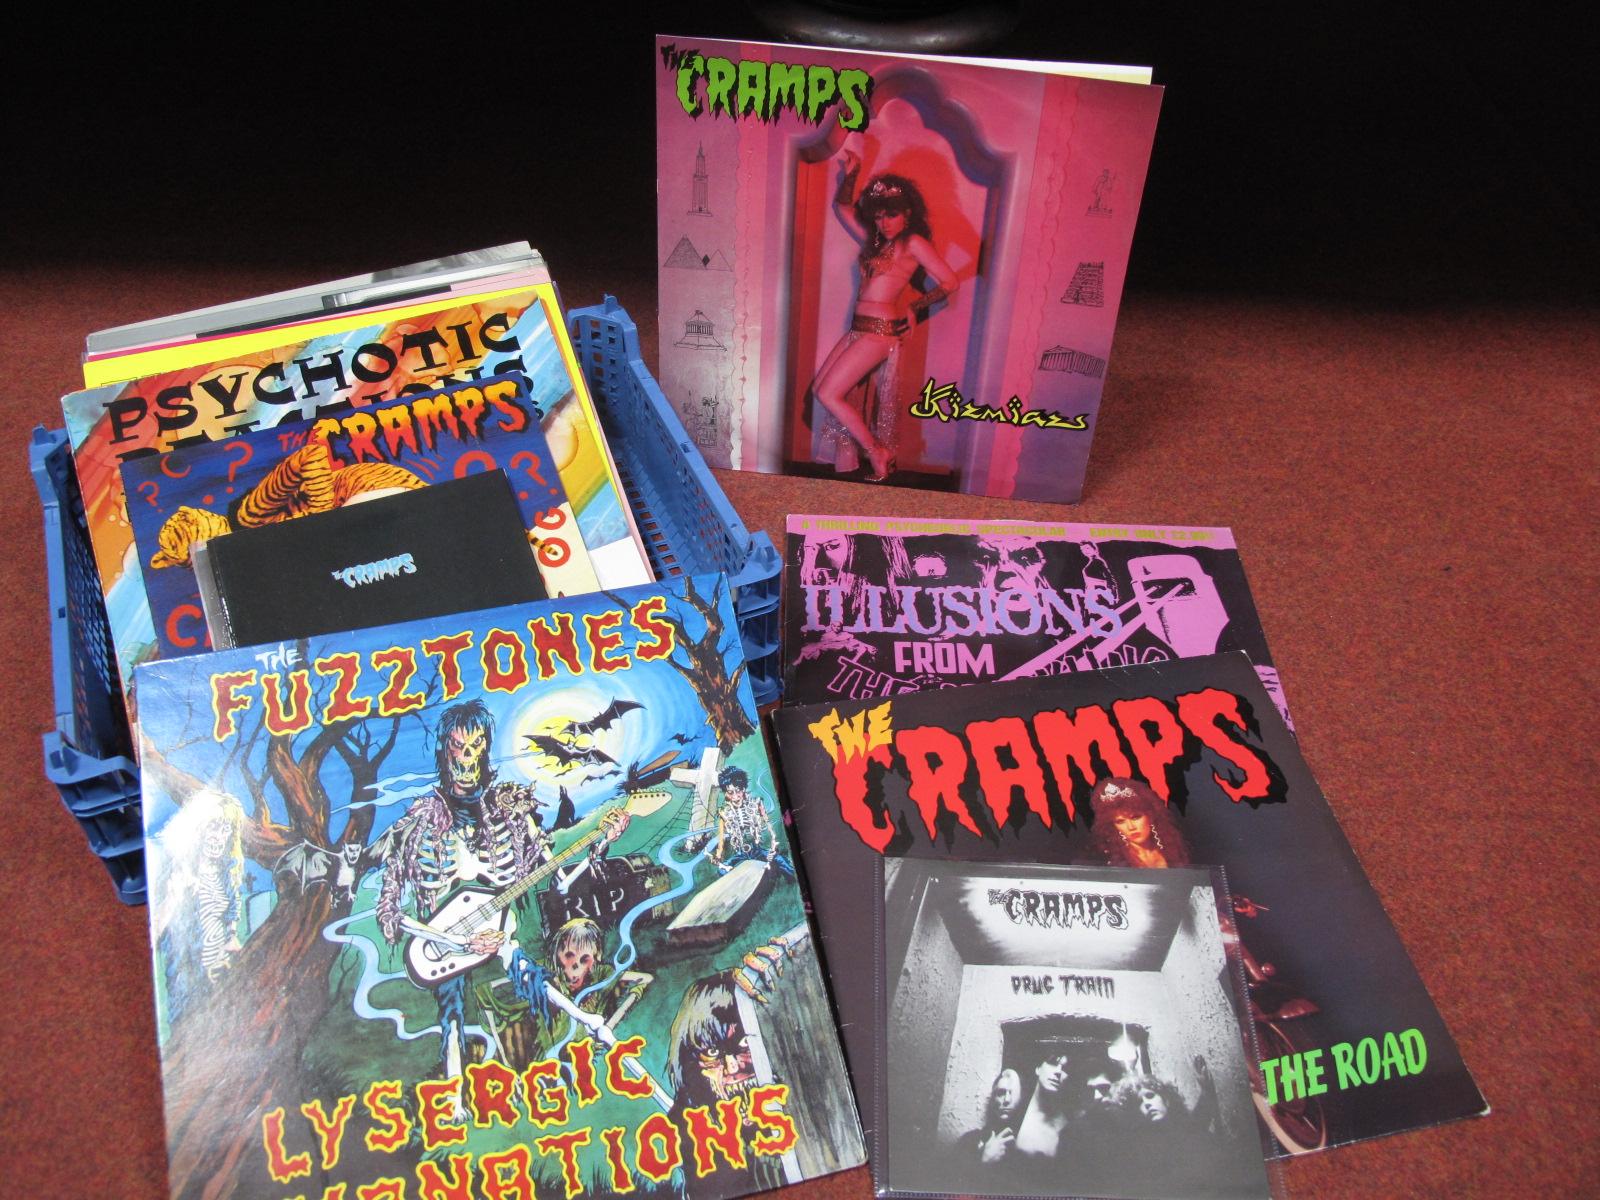 "Lot 617 - The Cramps 'Kizmiaz' 12"" Single, pink vinyl, 'Get Off The Road', 10"" and 7"" singles, Fuzztones;"